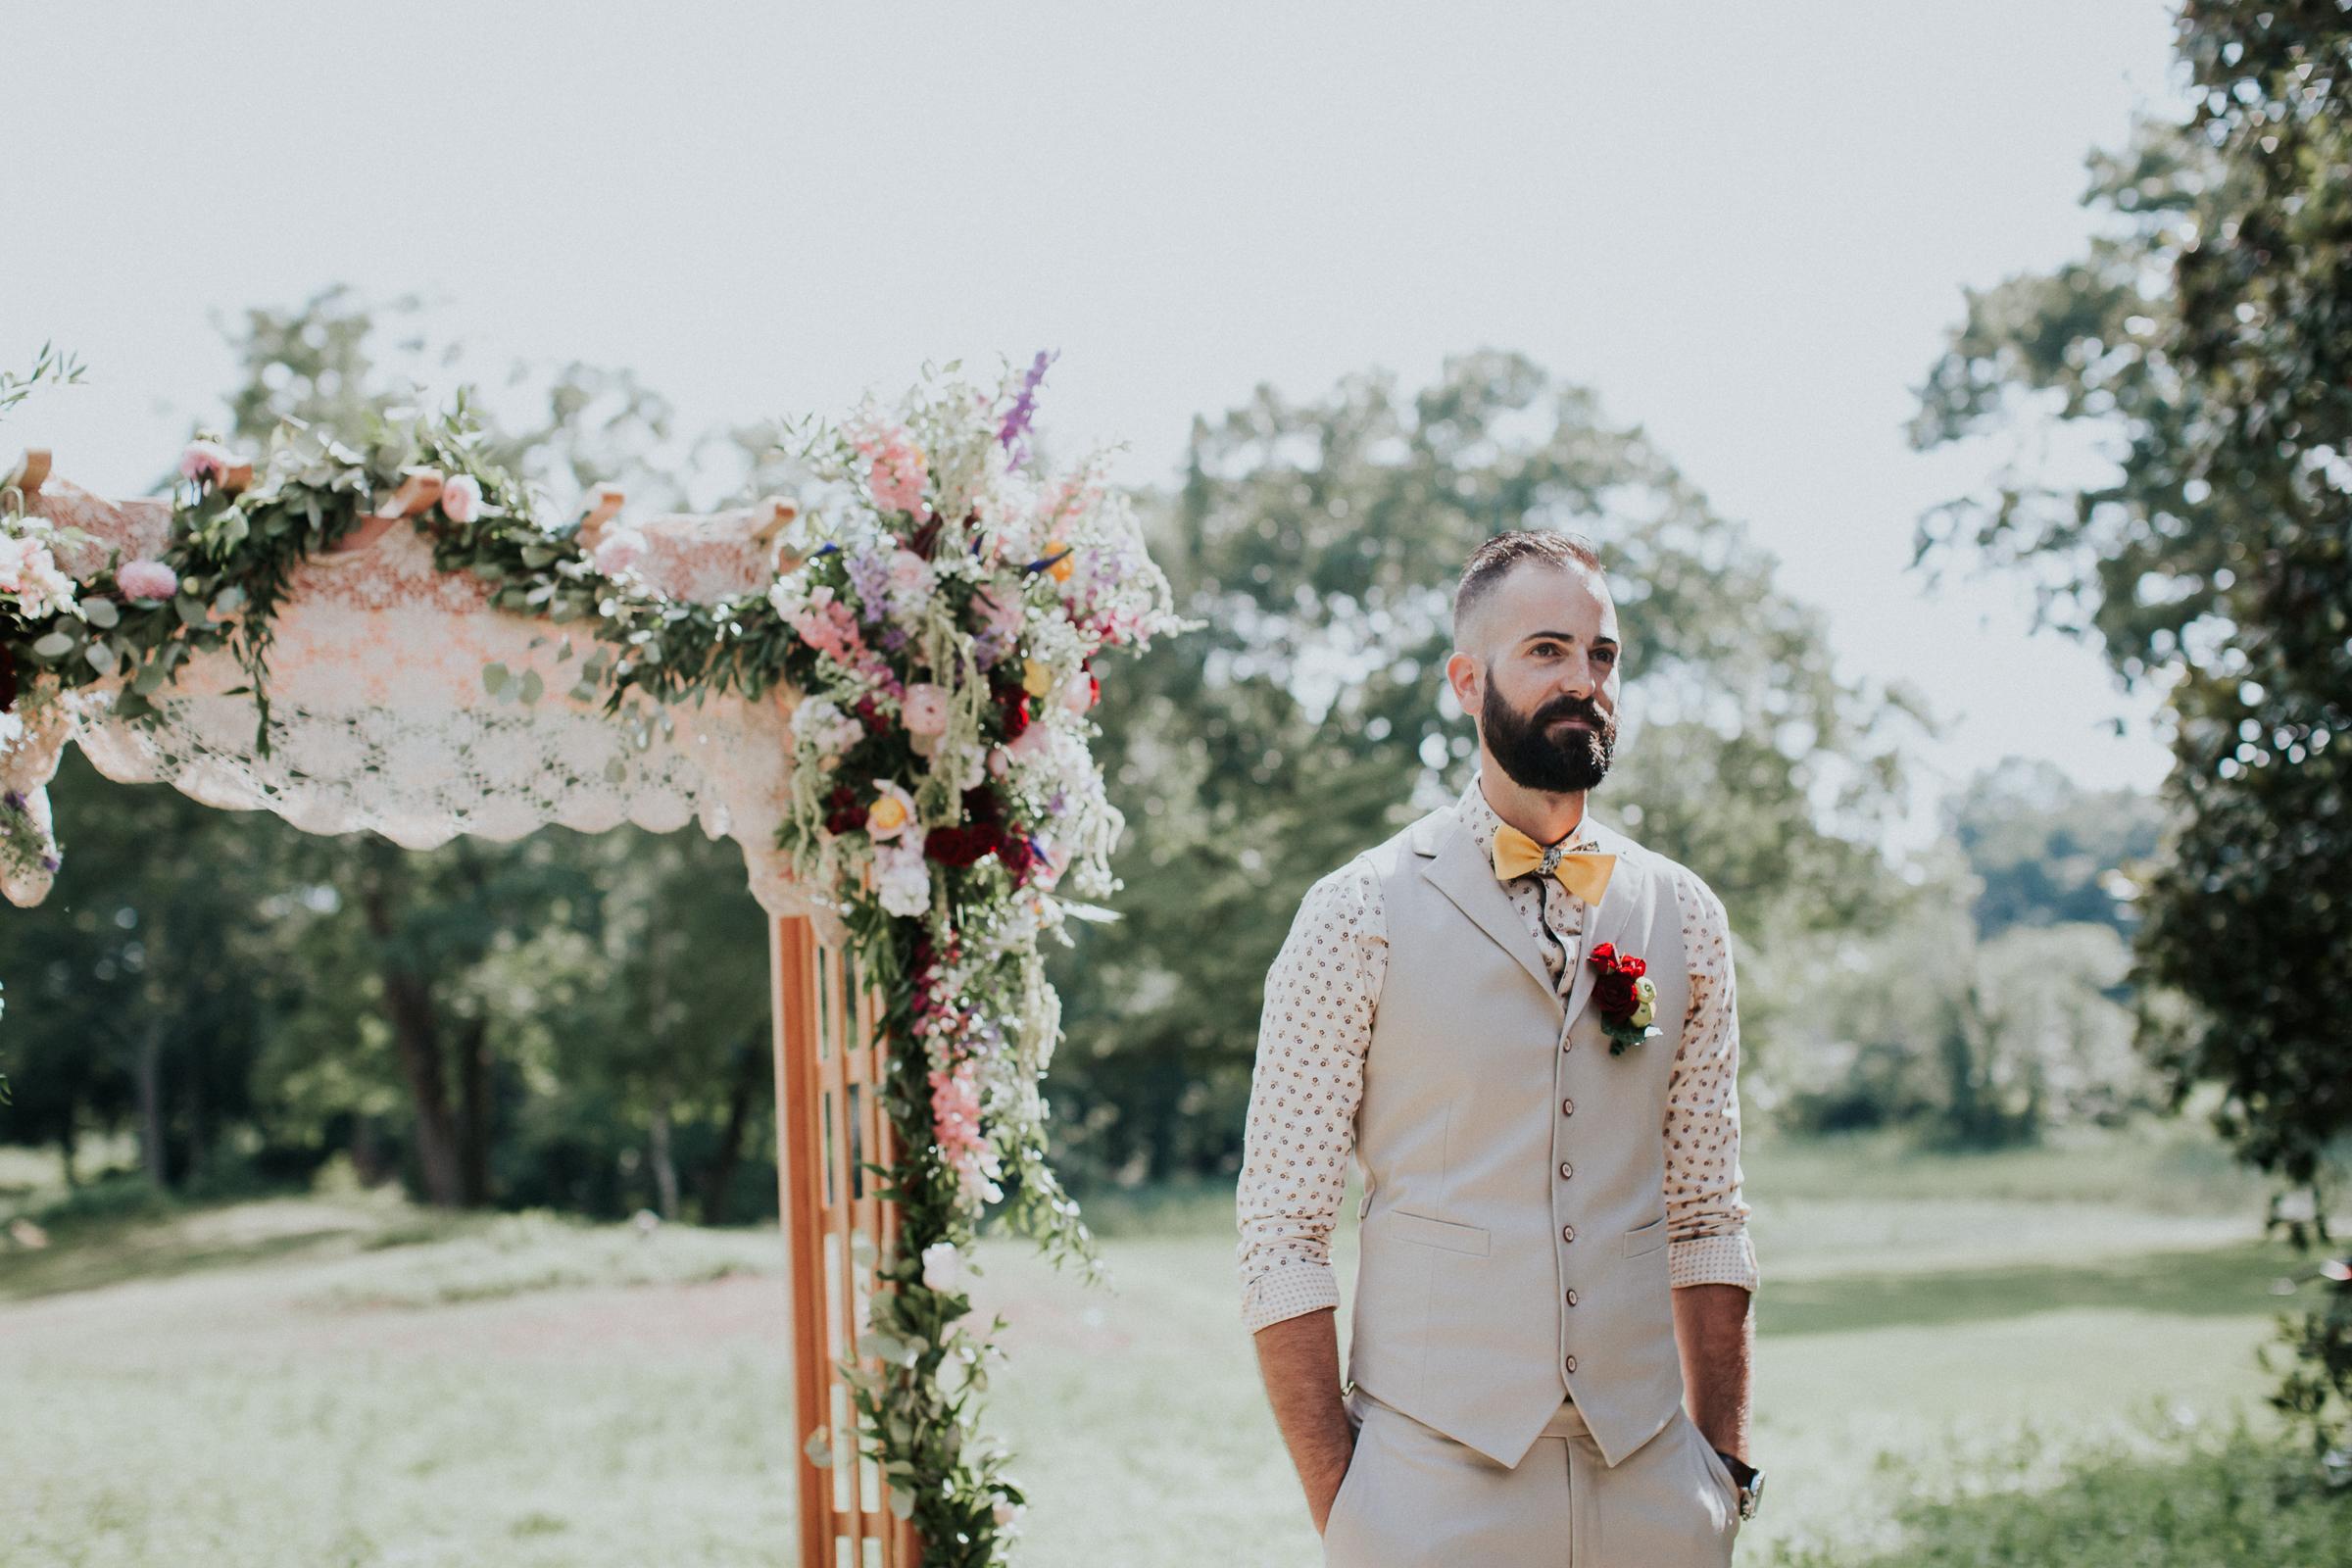 Backyard-Intimate-Adventurous-Destination-Wedding-Darien-Connecticut-Documentary-Wedding-Photography-48.jpg